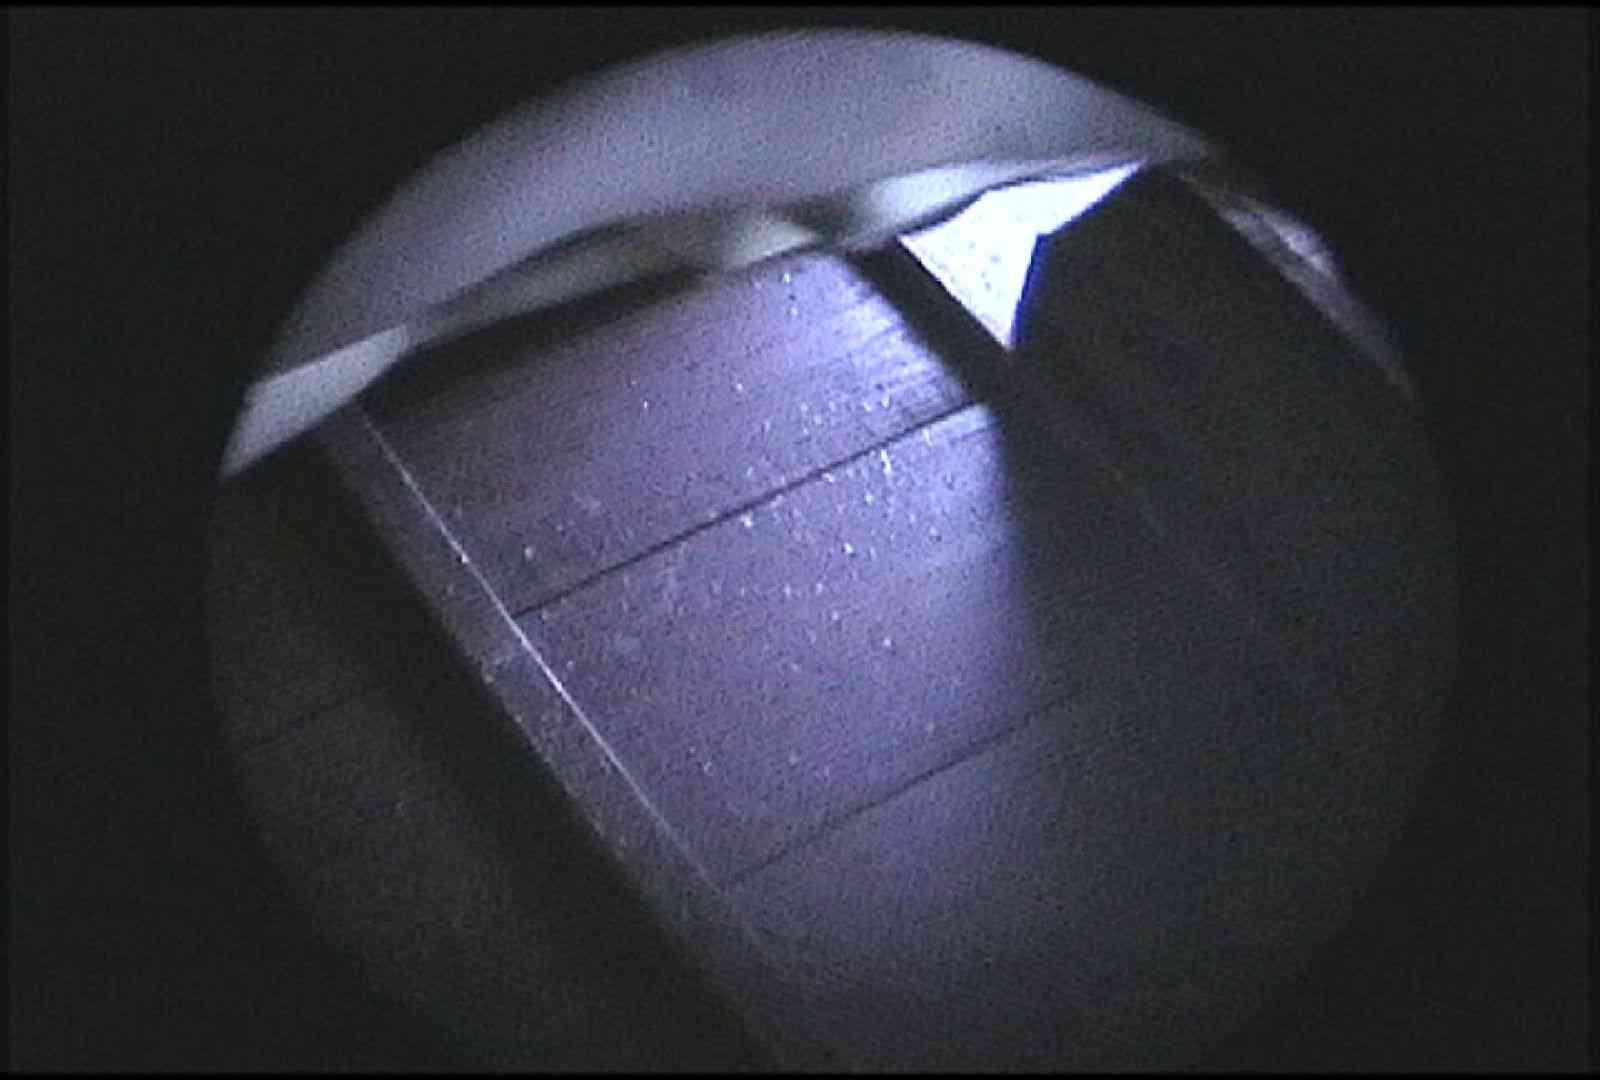 No.140 ブラジャーから年齢を推測してお楽しみください 美乳 オマンコ無修正動画無料 70画像 24